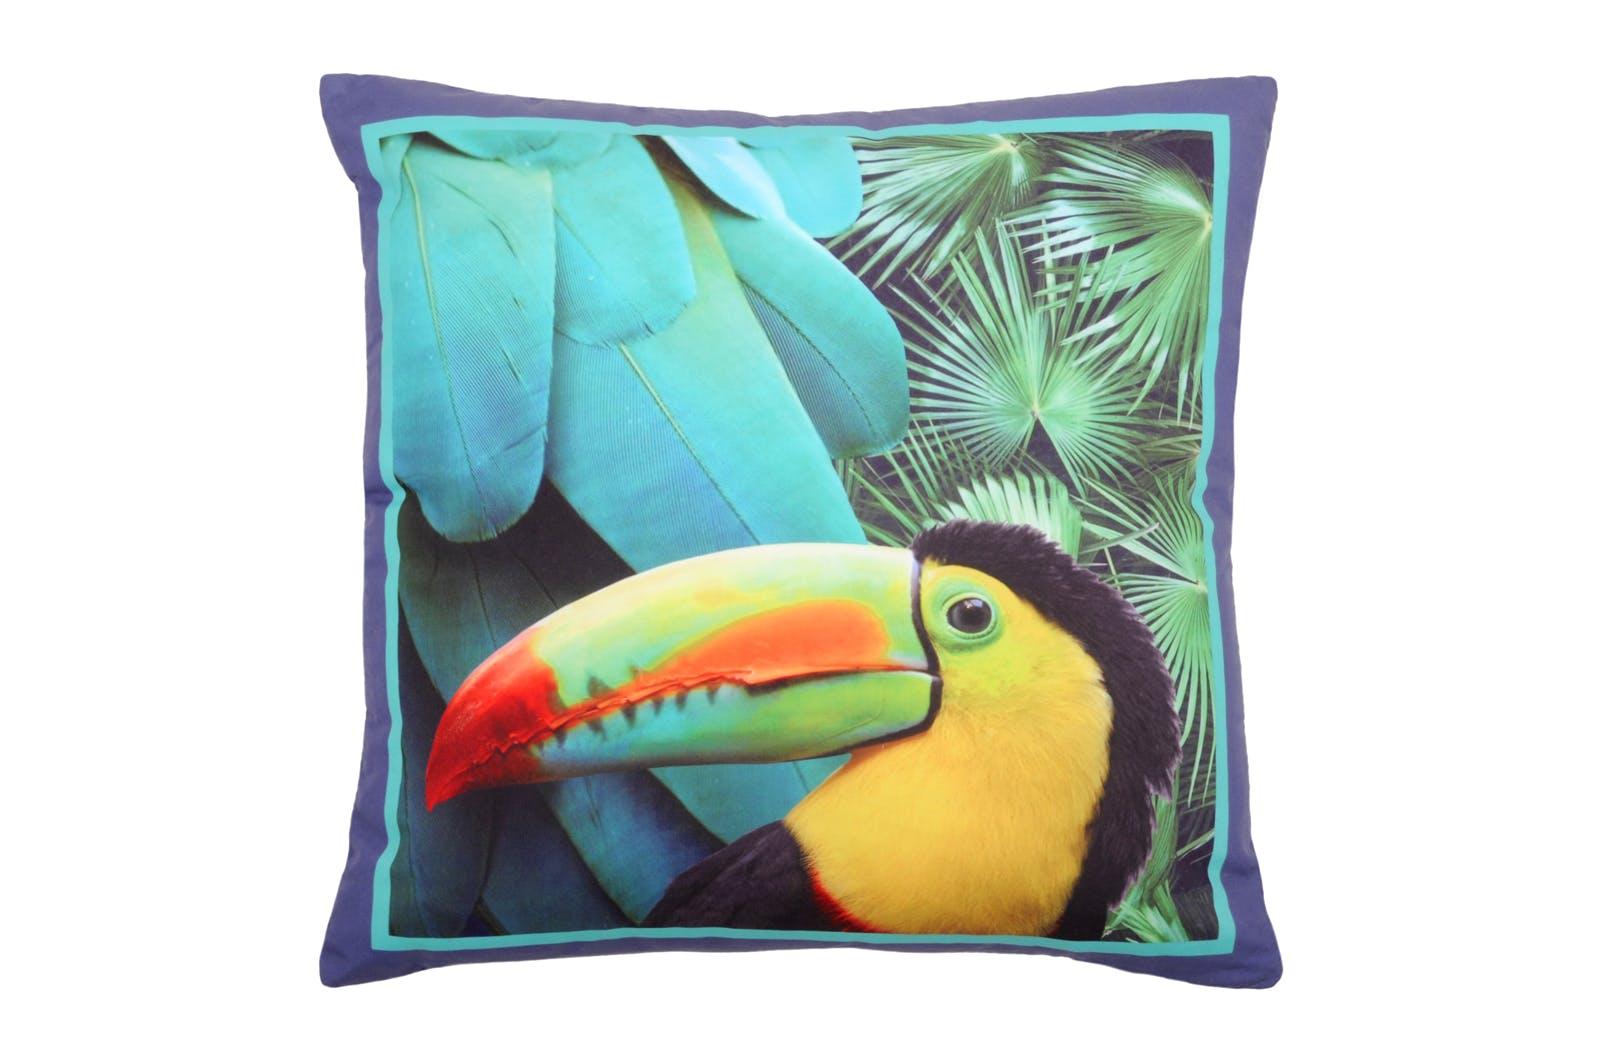 Coussin bleu imprimé toucan et plumes tons verts 40x40cm CYNARA